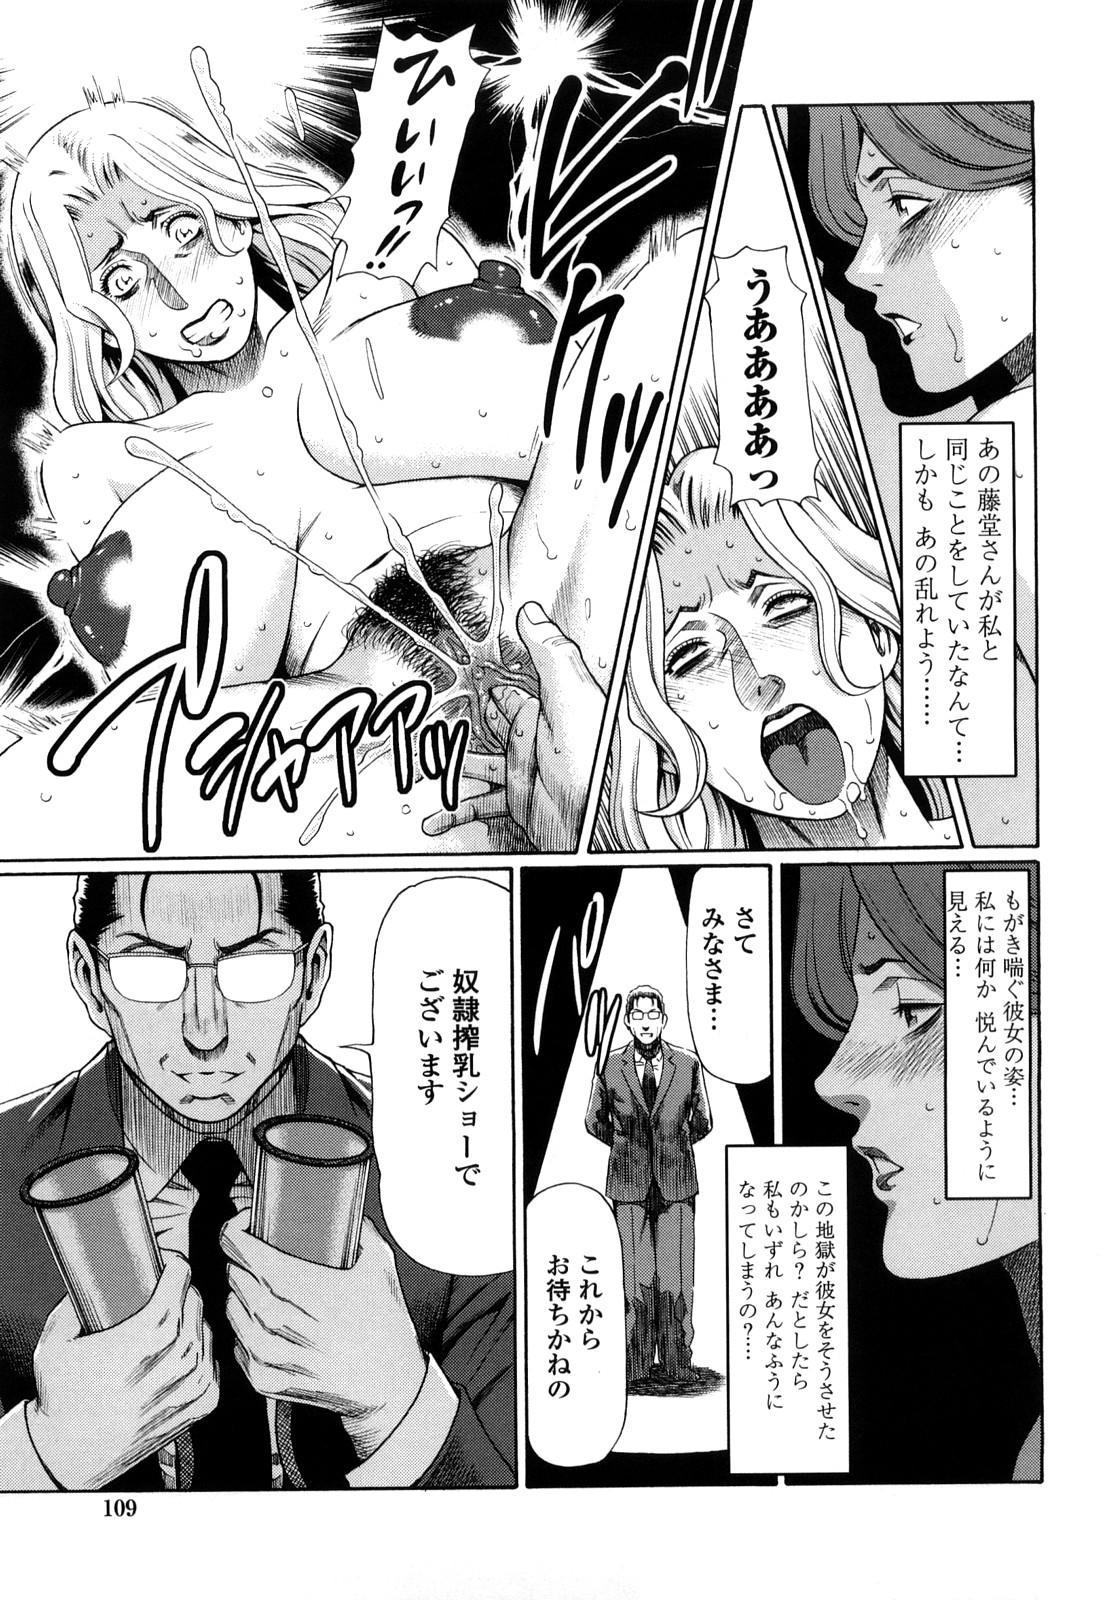 [Takasugi Kou] Kindan no Haha-Ana - Immorality Love-Hole [Decensored] 110